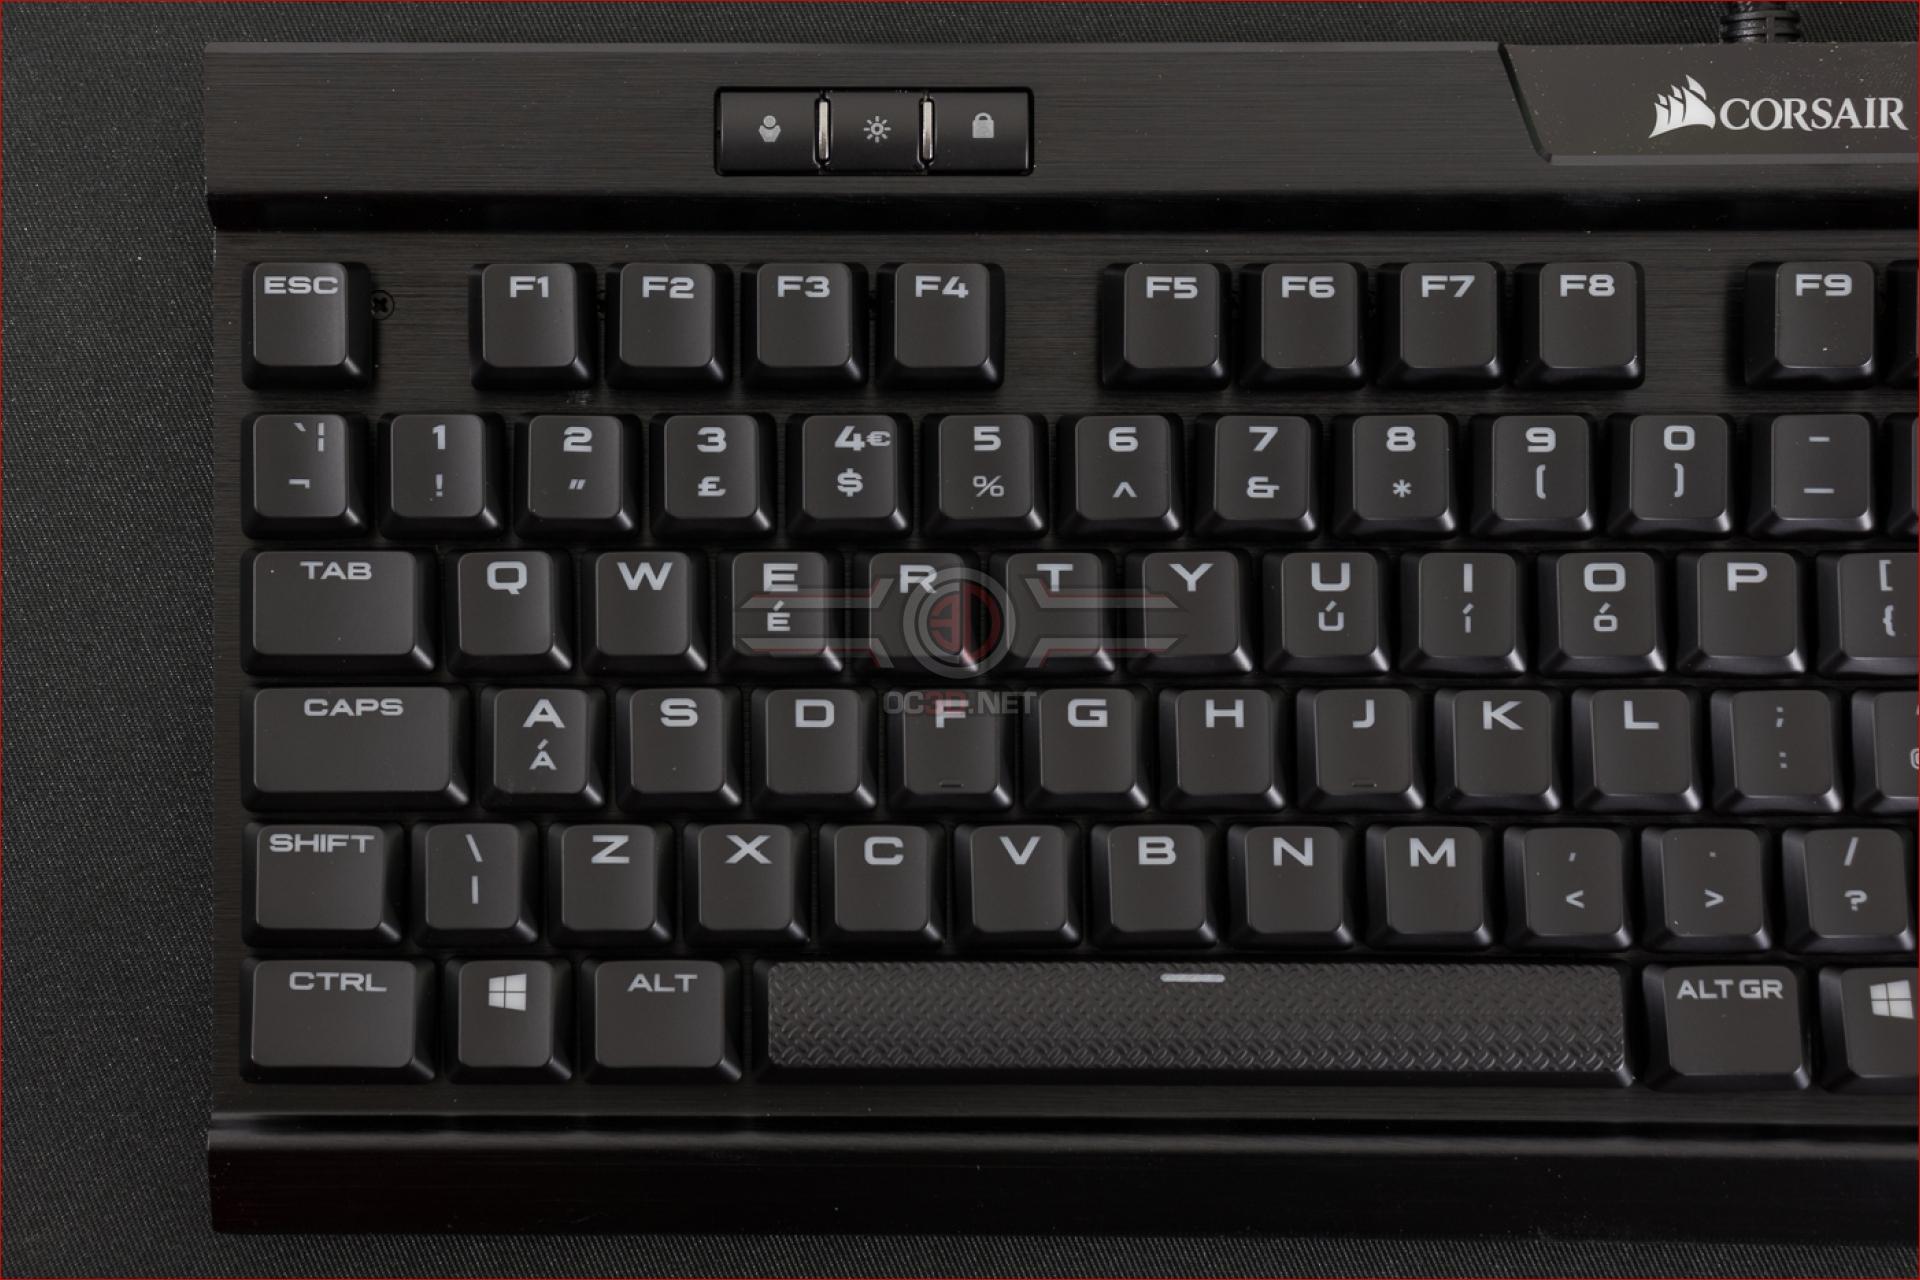 Corsair K70 RGB Mk 2 Low Profile Keyboard Review | Up Close